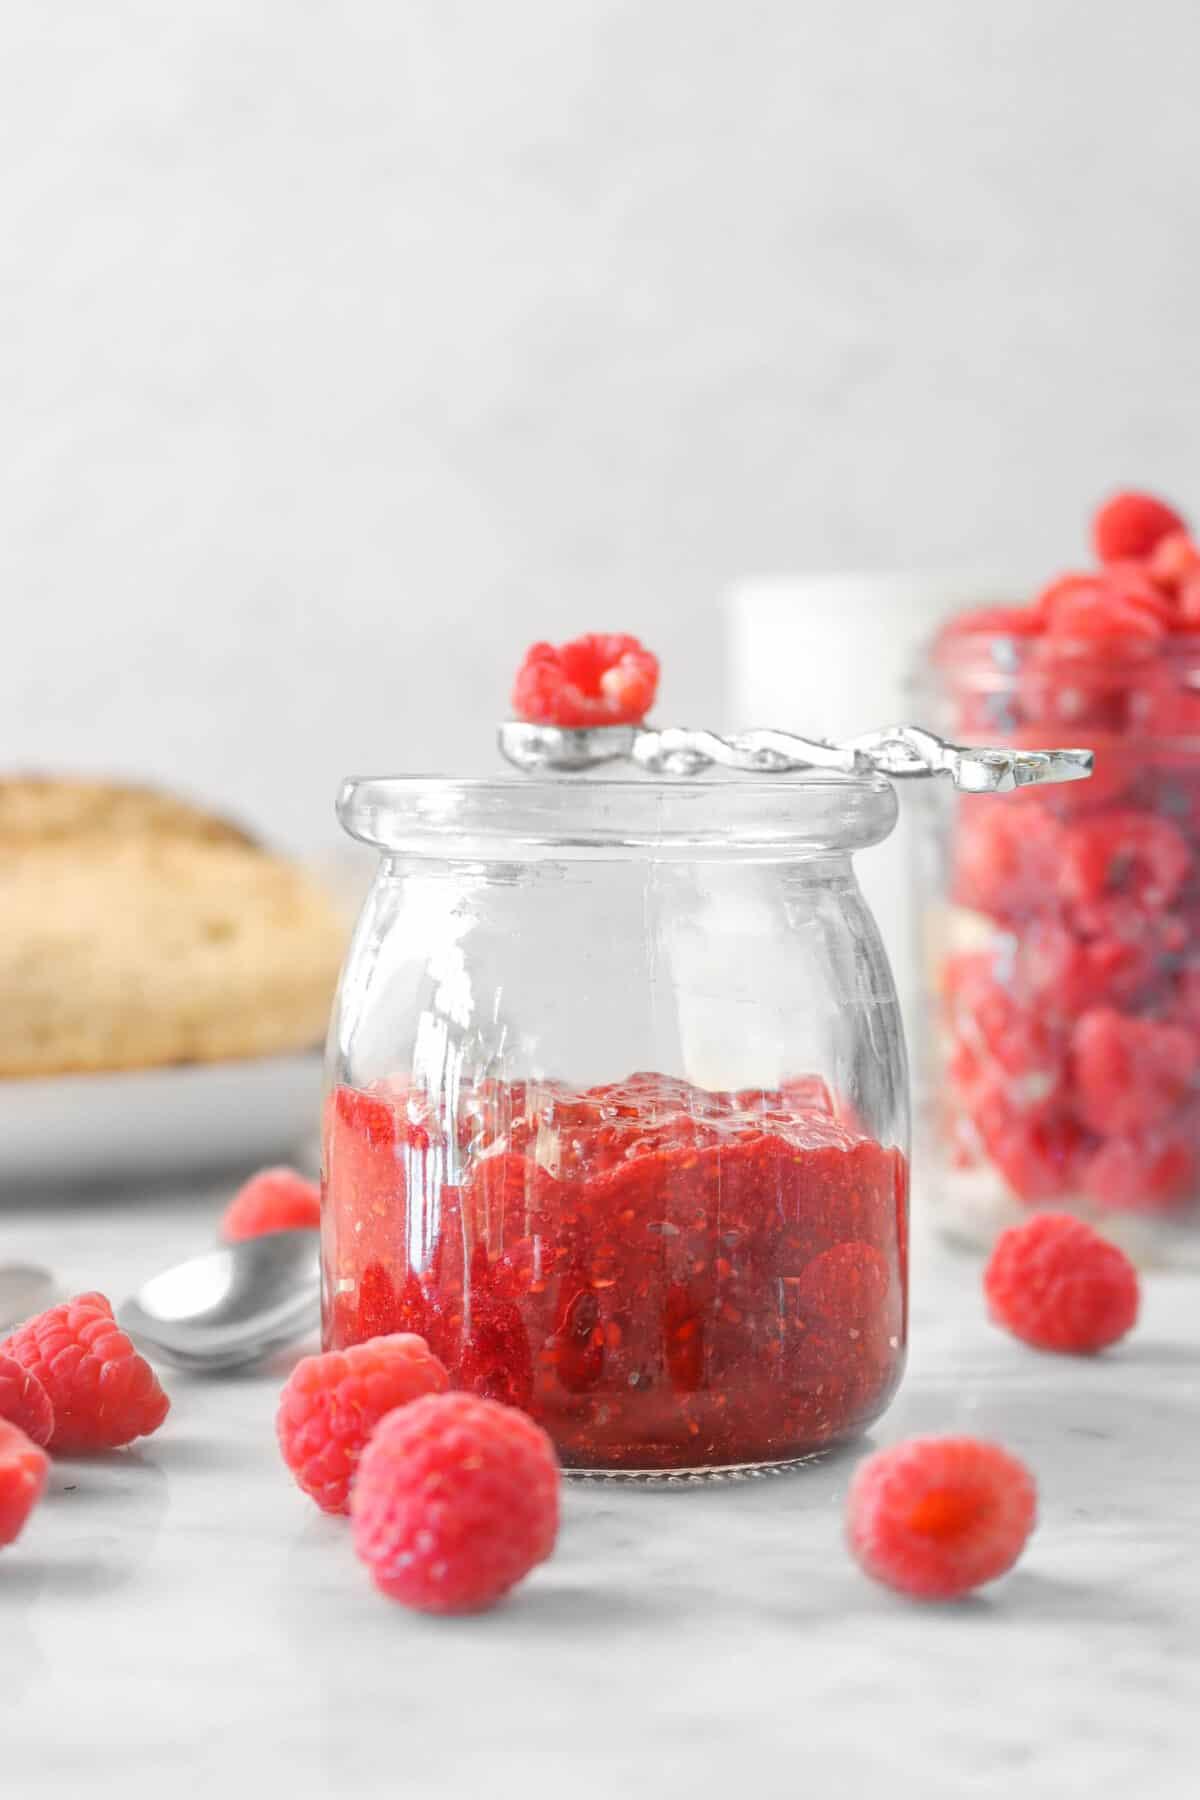 raspberry jam in a glass jar with fresh raspberries, bread, and a jar of raspberries in the background